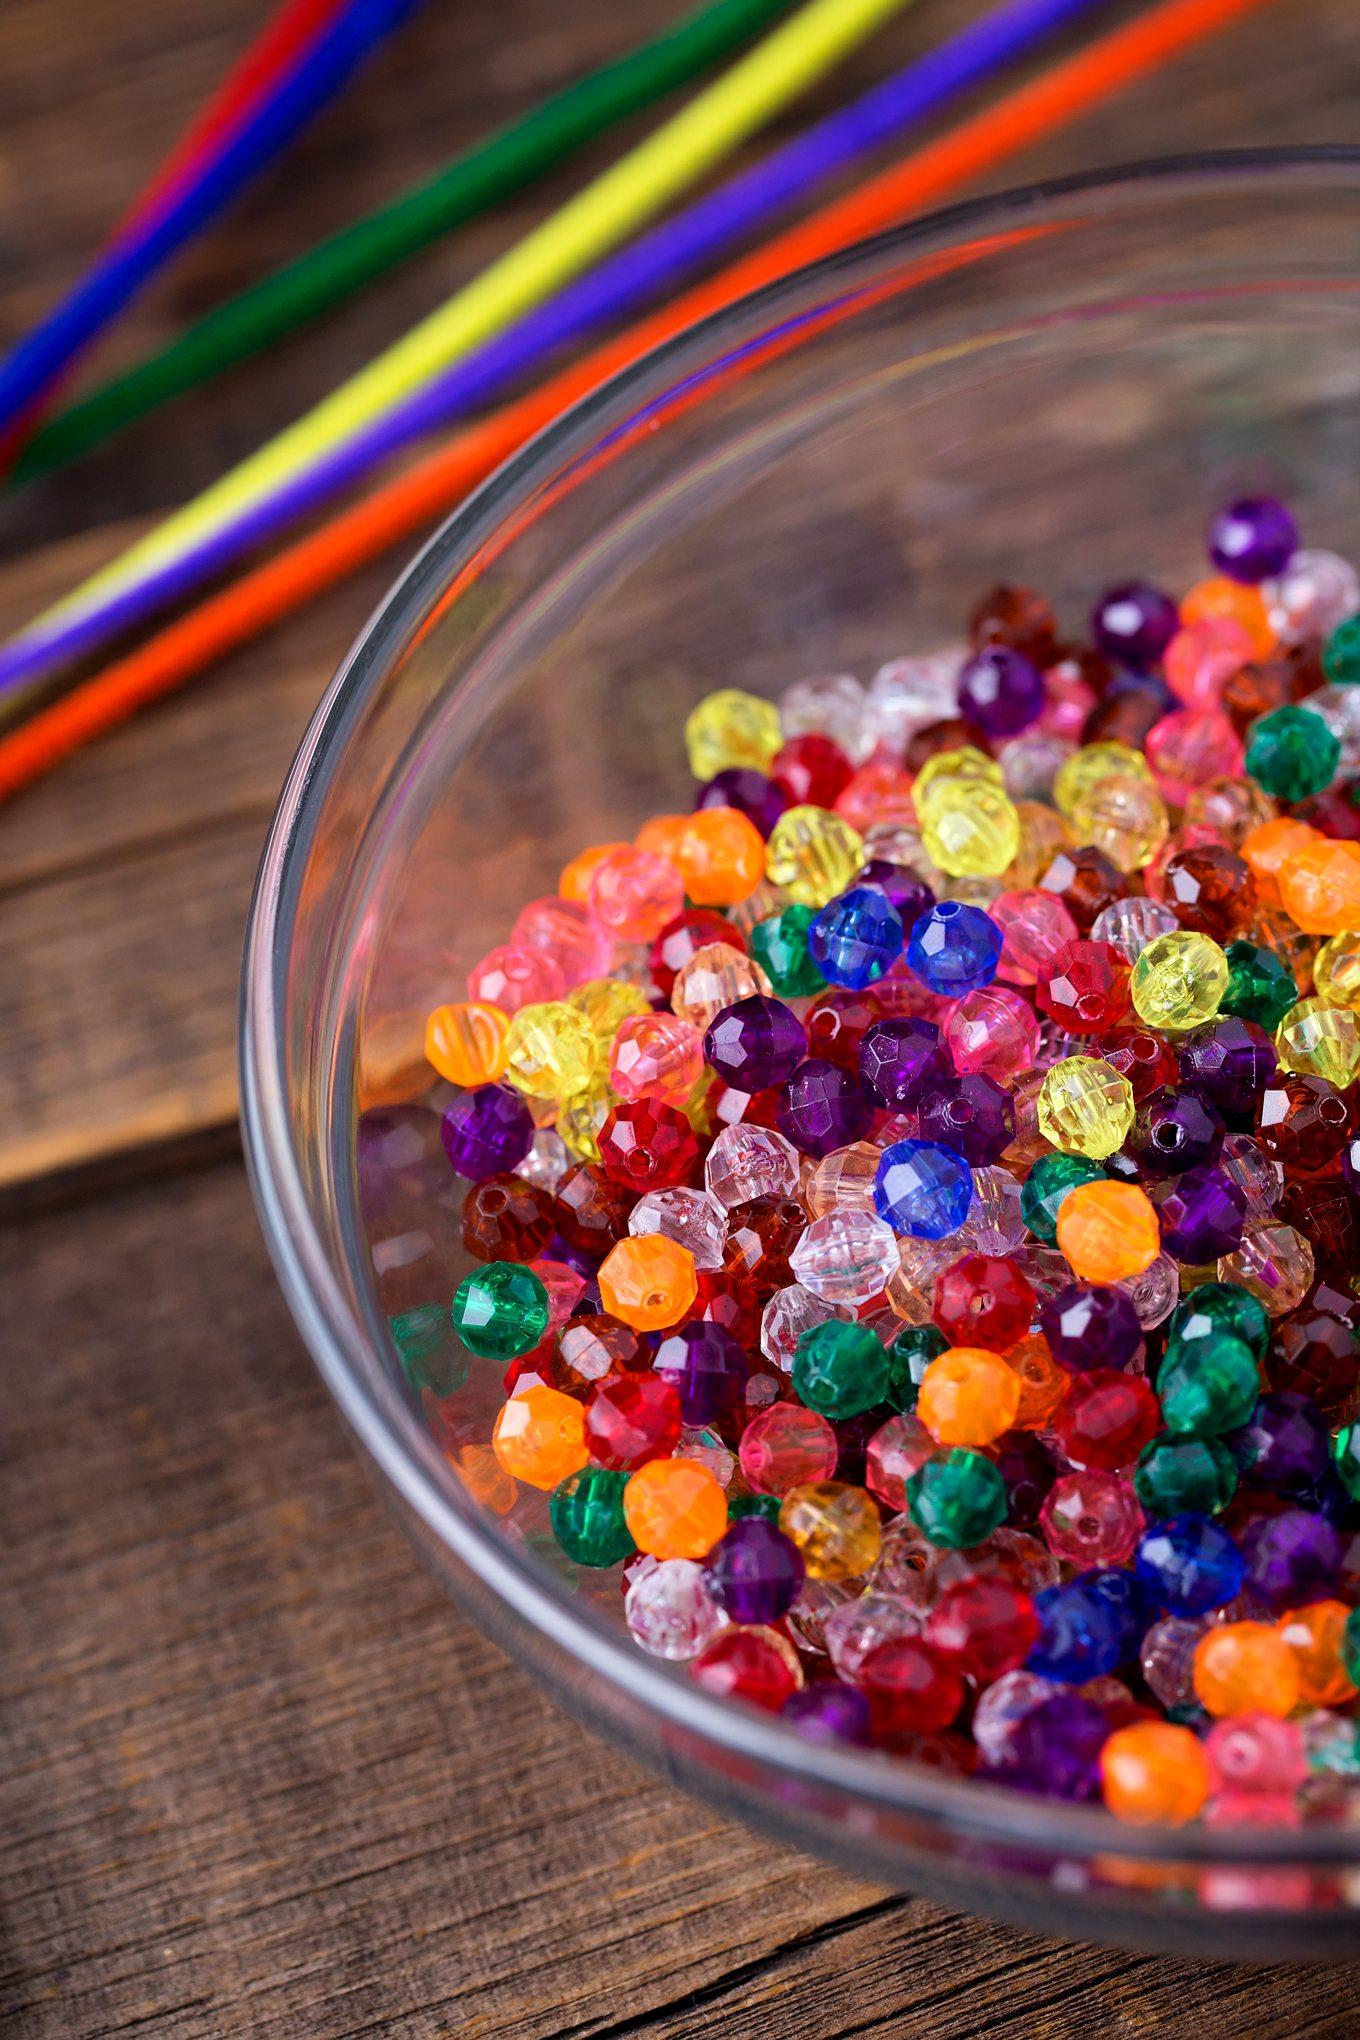 Materials Needed for Beaded Rainbow Suncatchers